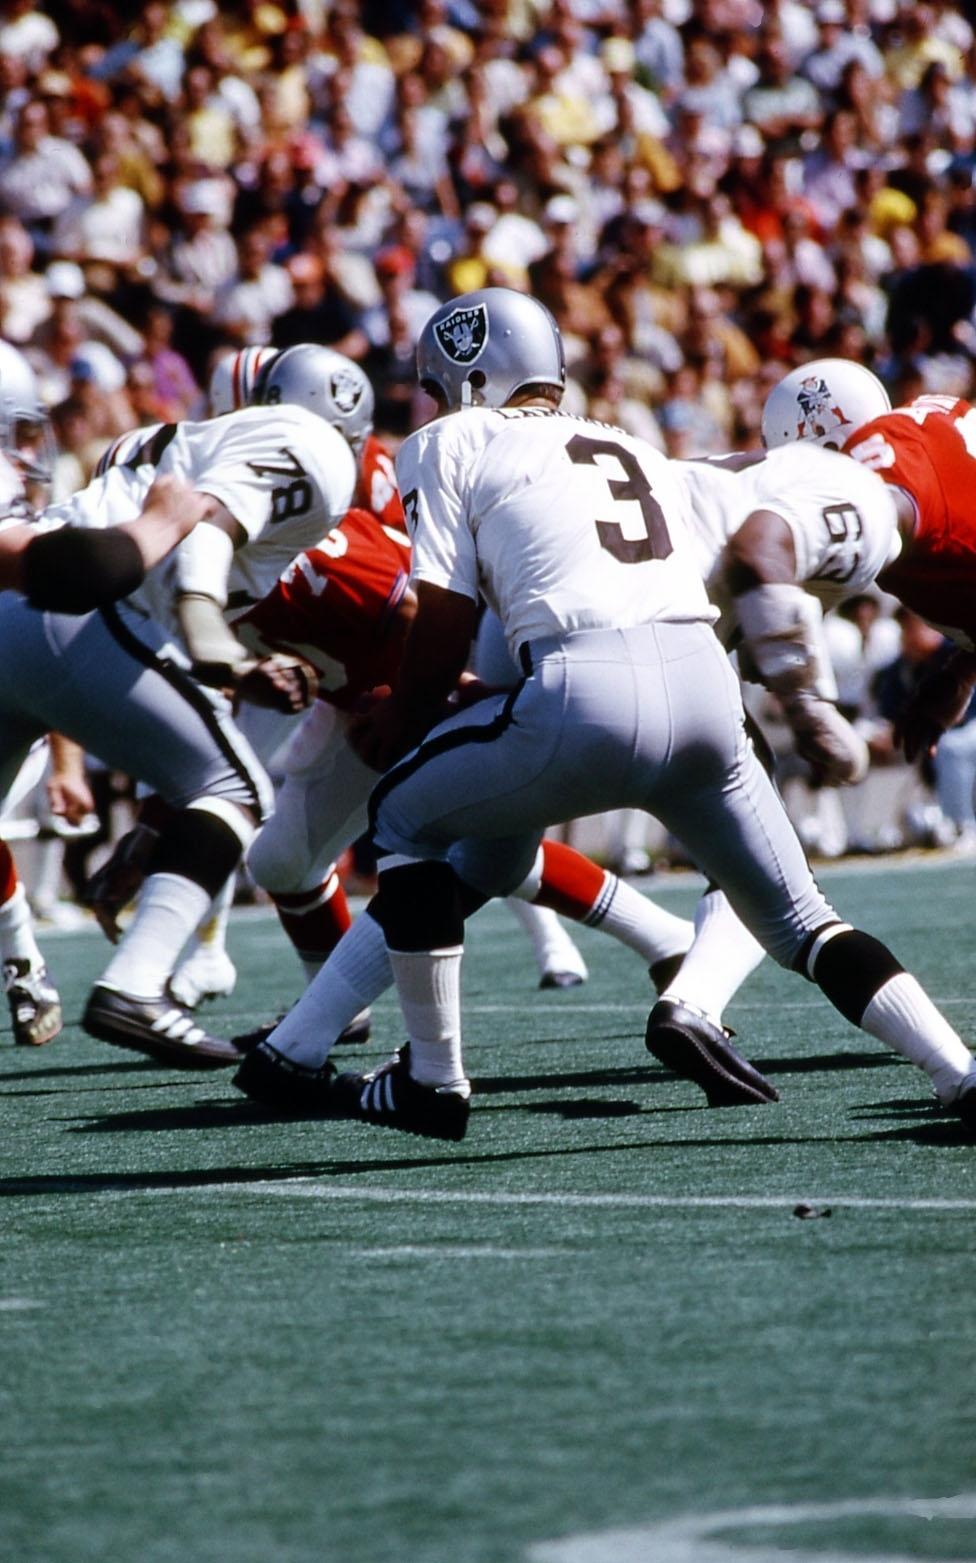 Daryle Lamonica - Oakland Raiders, 1971